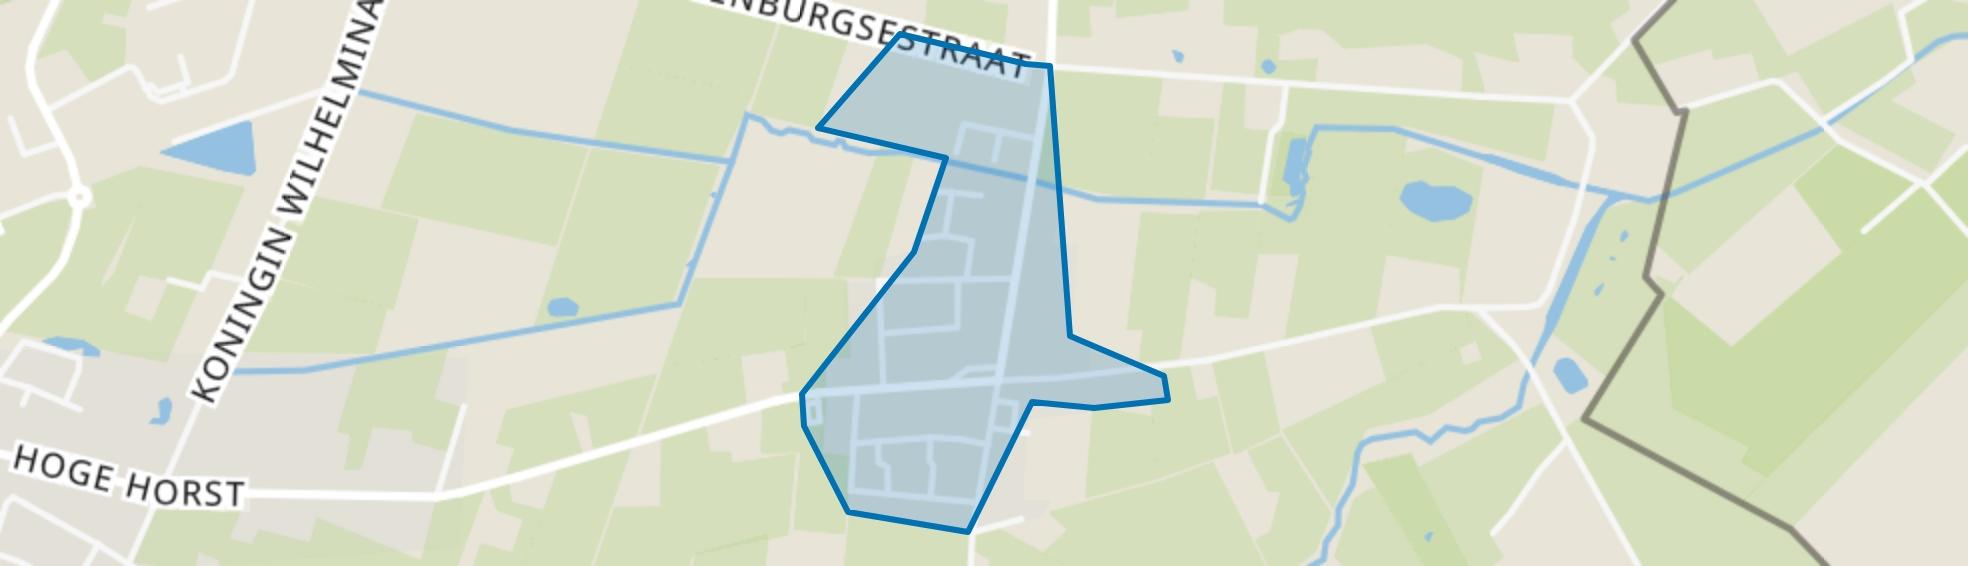 De Horst, Groesbeek map